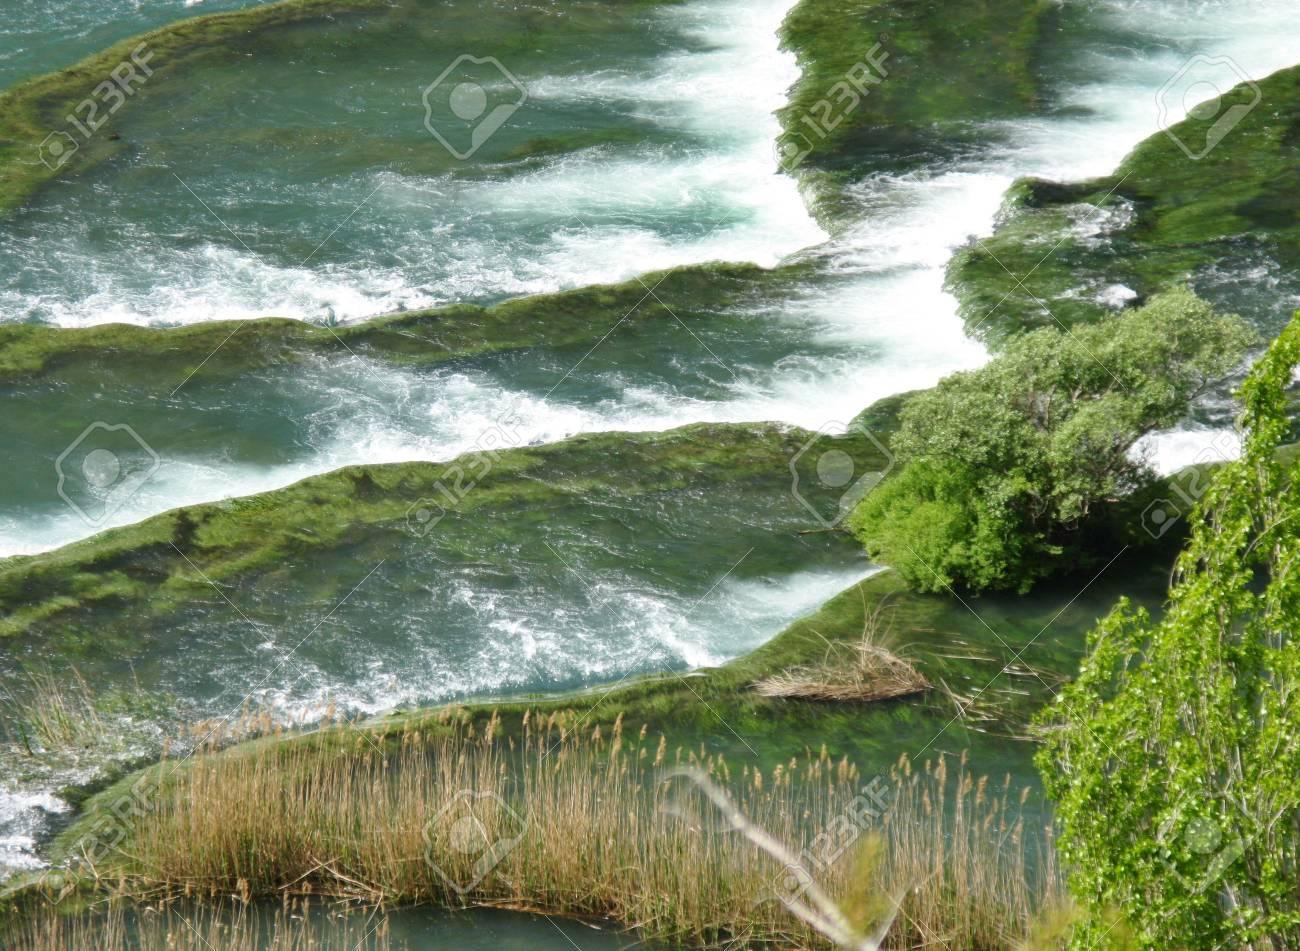 Rapids in the Krka River above the Roski Slap waterfalls in Croatia Stock Photo - 14502564